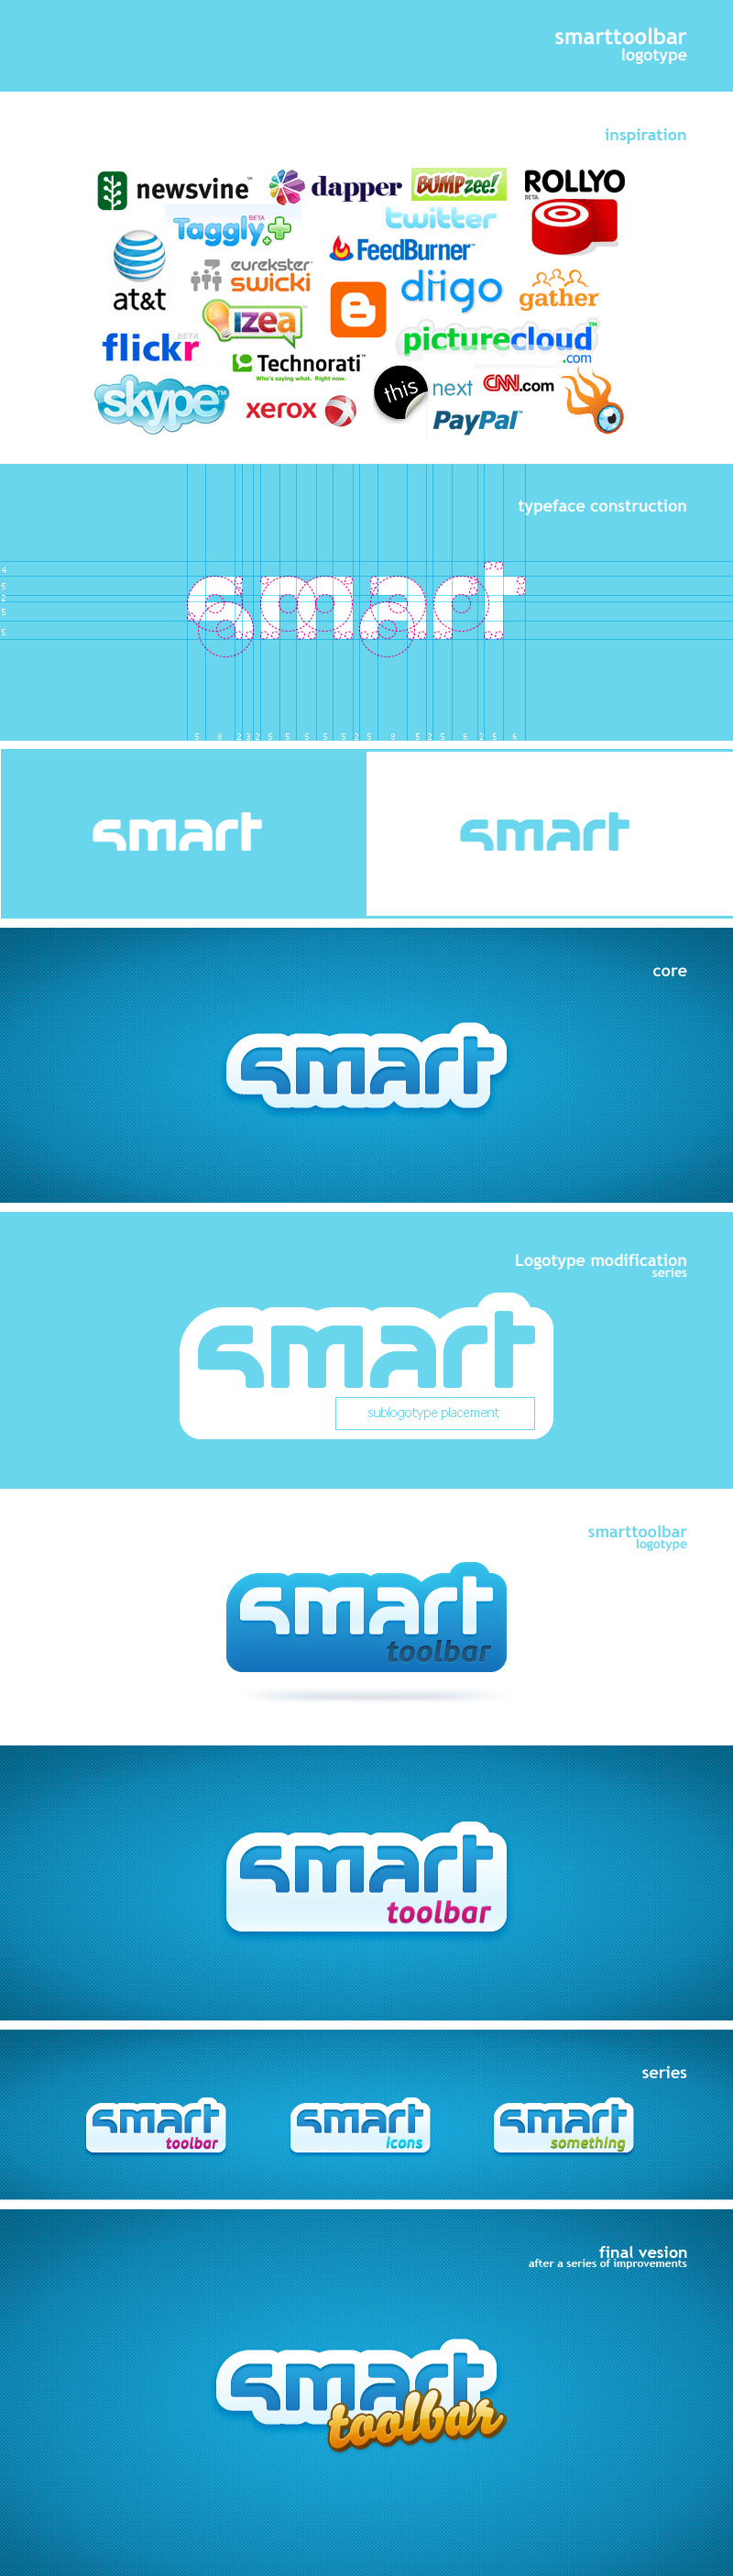 SmartToolbar